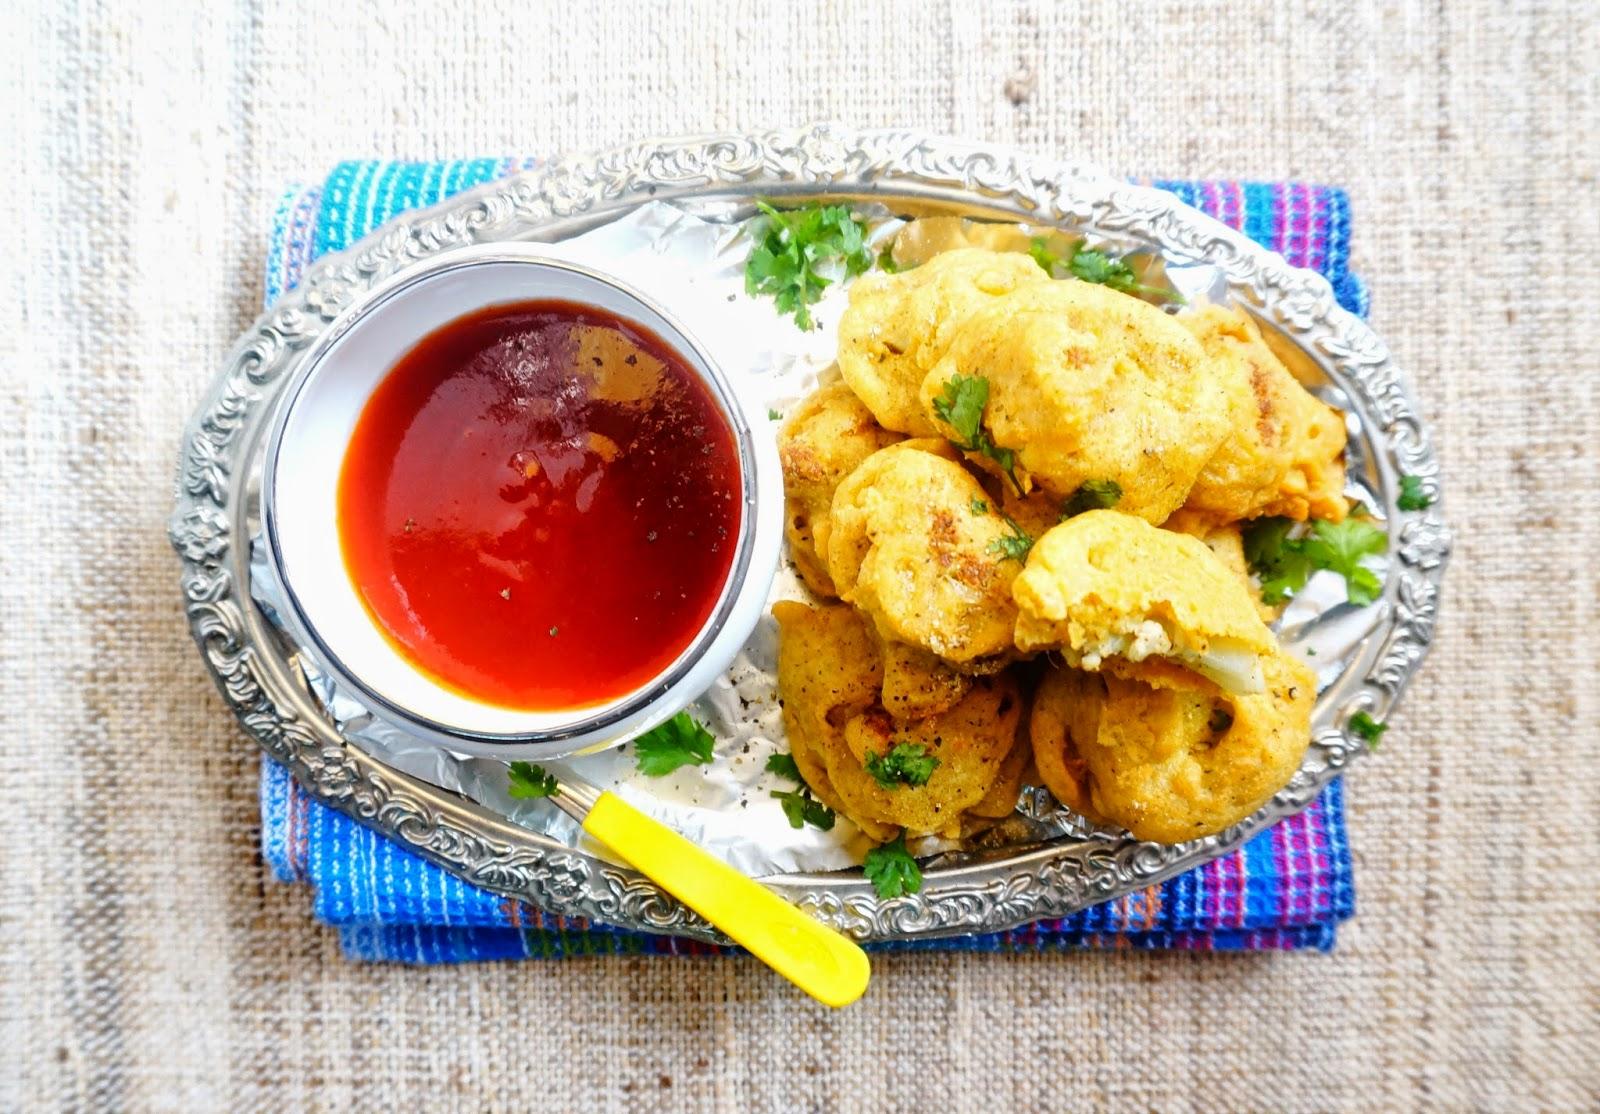 cauliflower pakoda,gobhi pakoda,fritters,snacks,starters